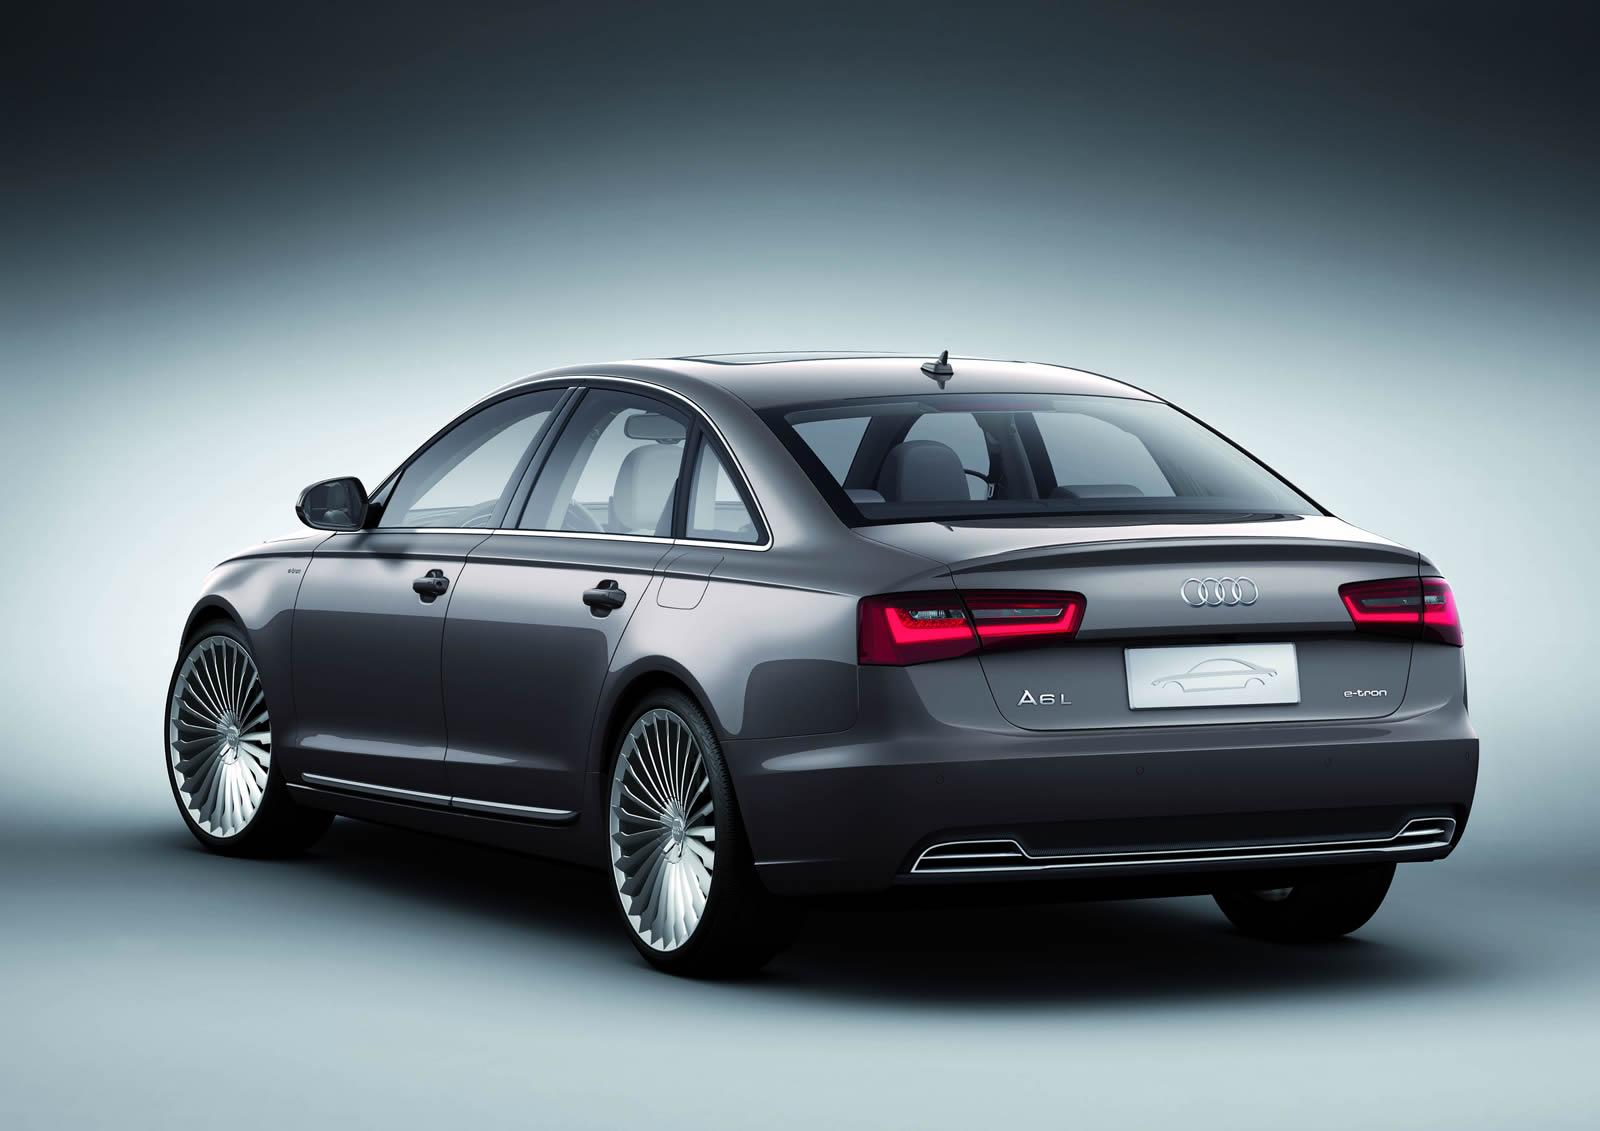 Audi A6 L e-tron. Концепт 2012 года